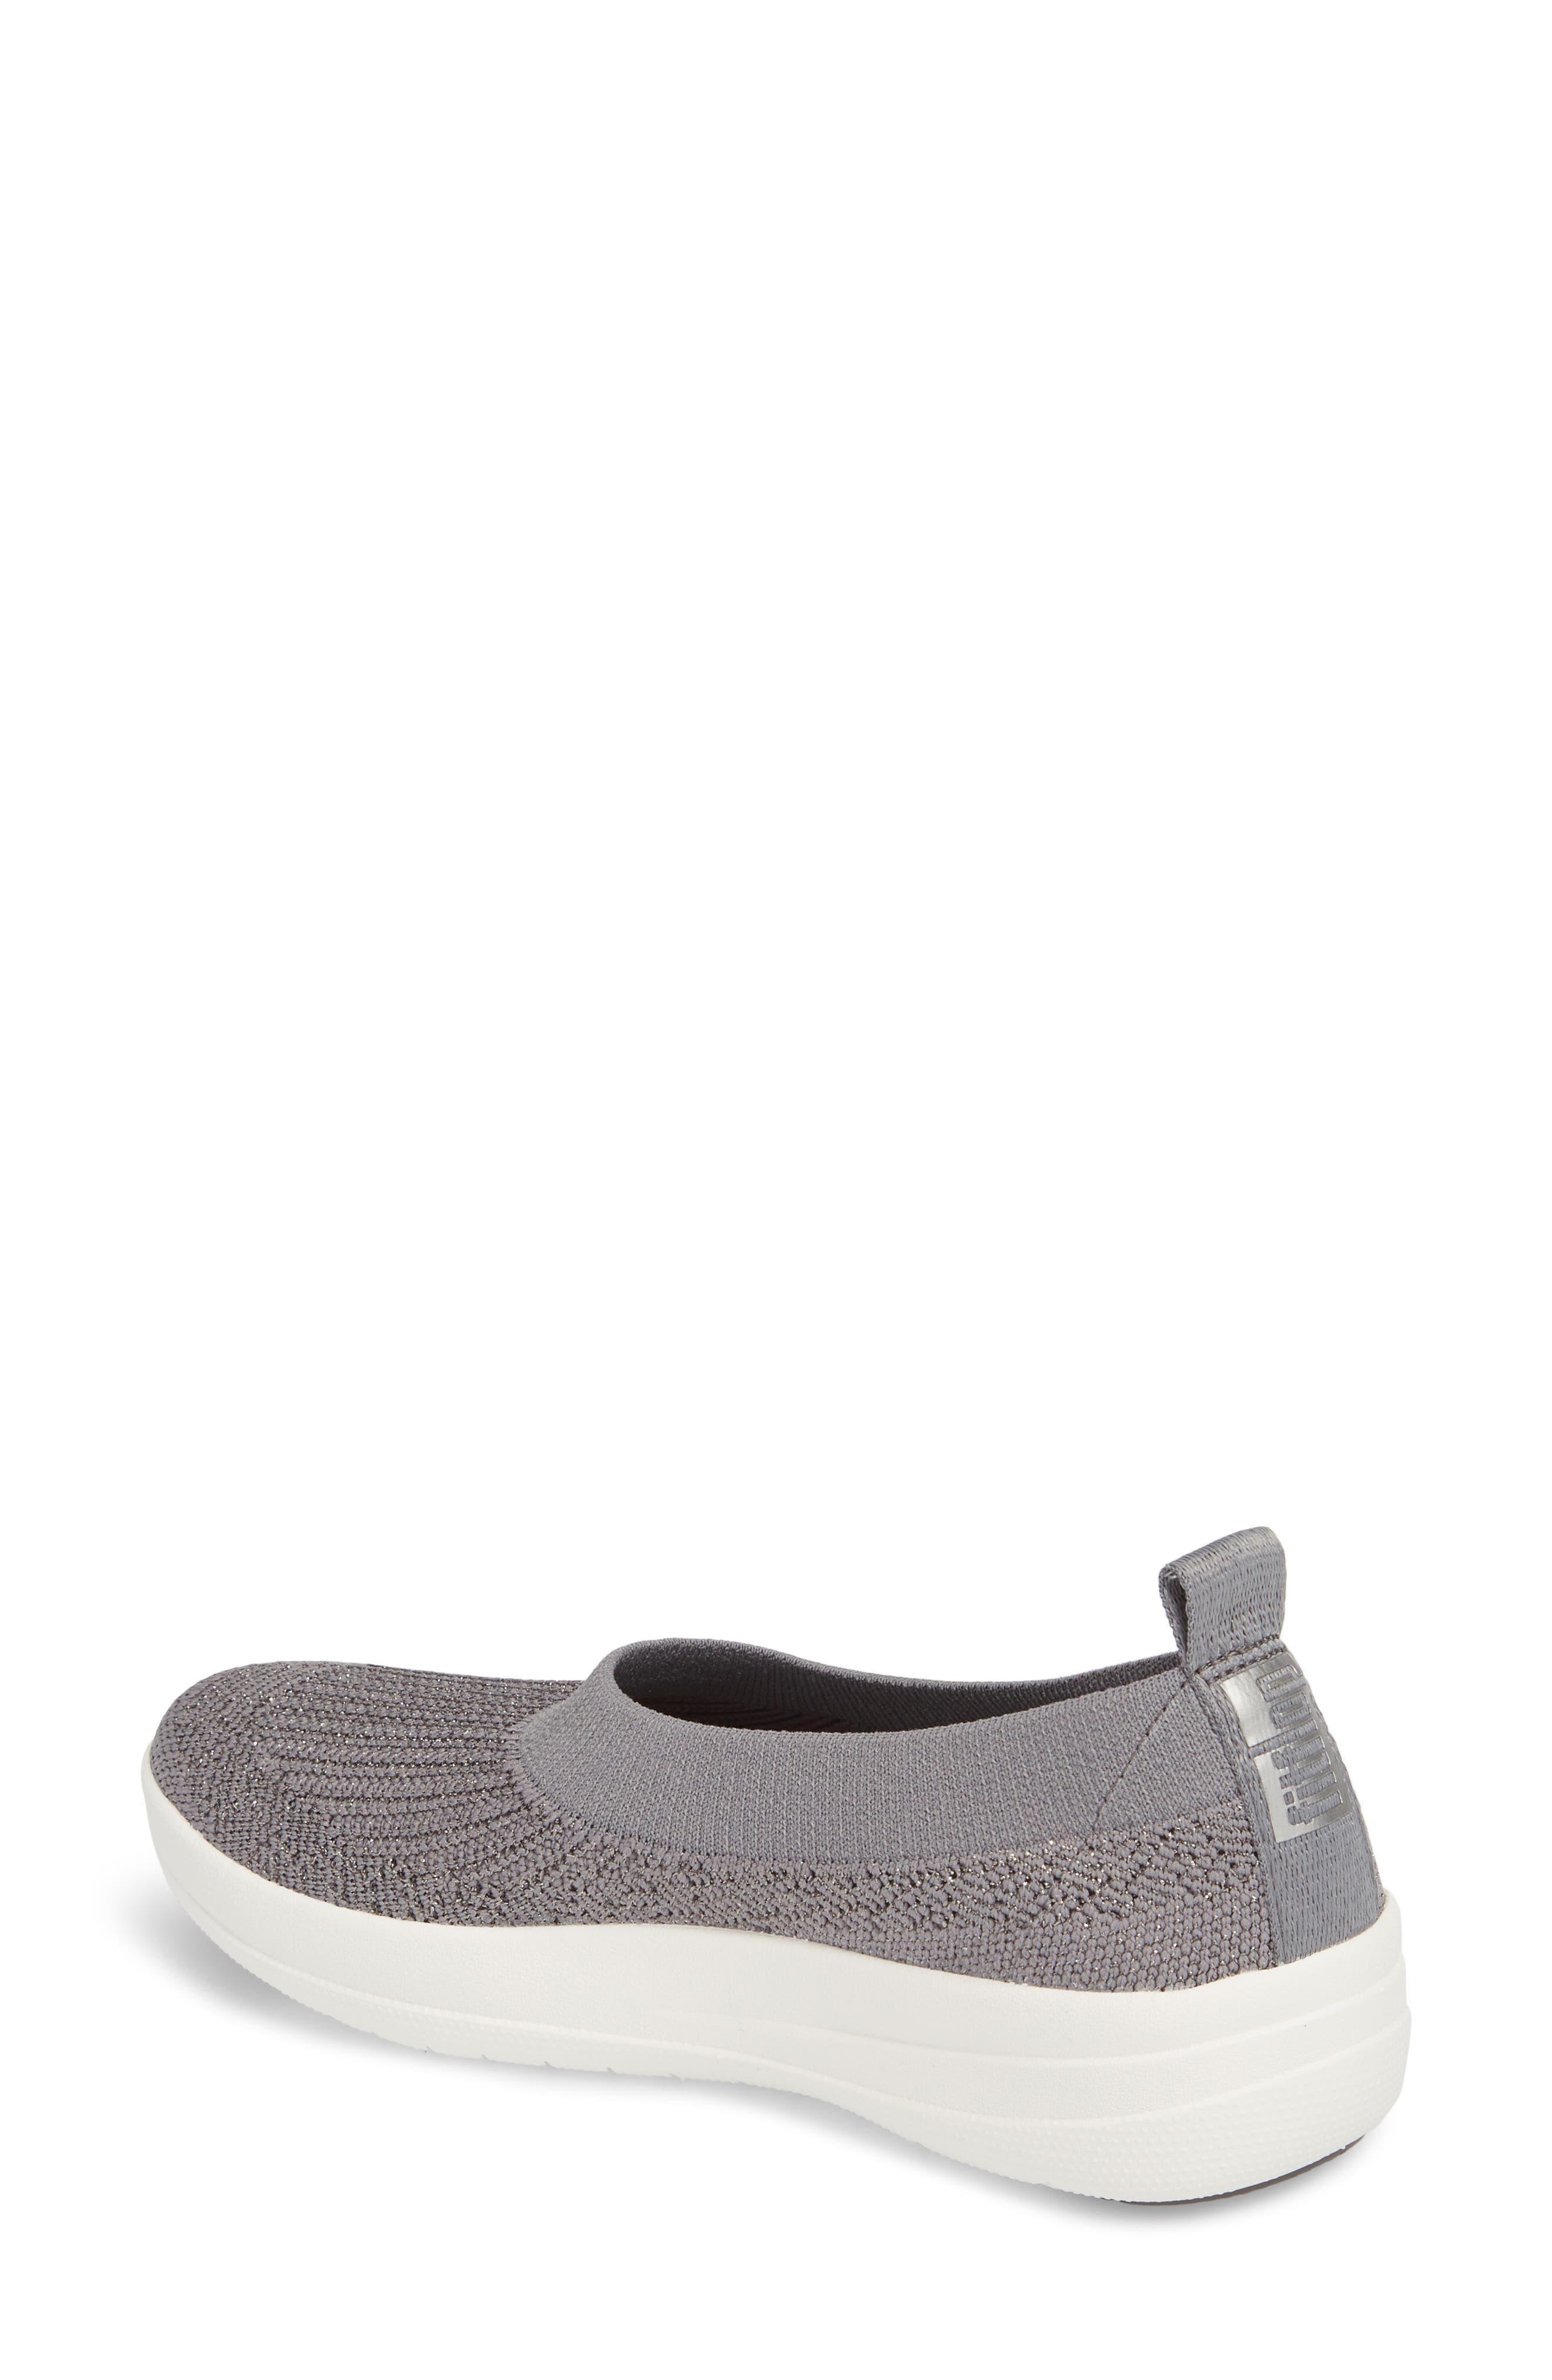 Uberknit<sup>™</sup> Slip-On Ballerina Sneaker,                             Alternate thumbnail 2, color,                             Charcoal/ Metallic Pewter